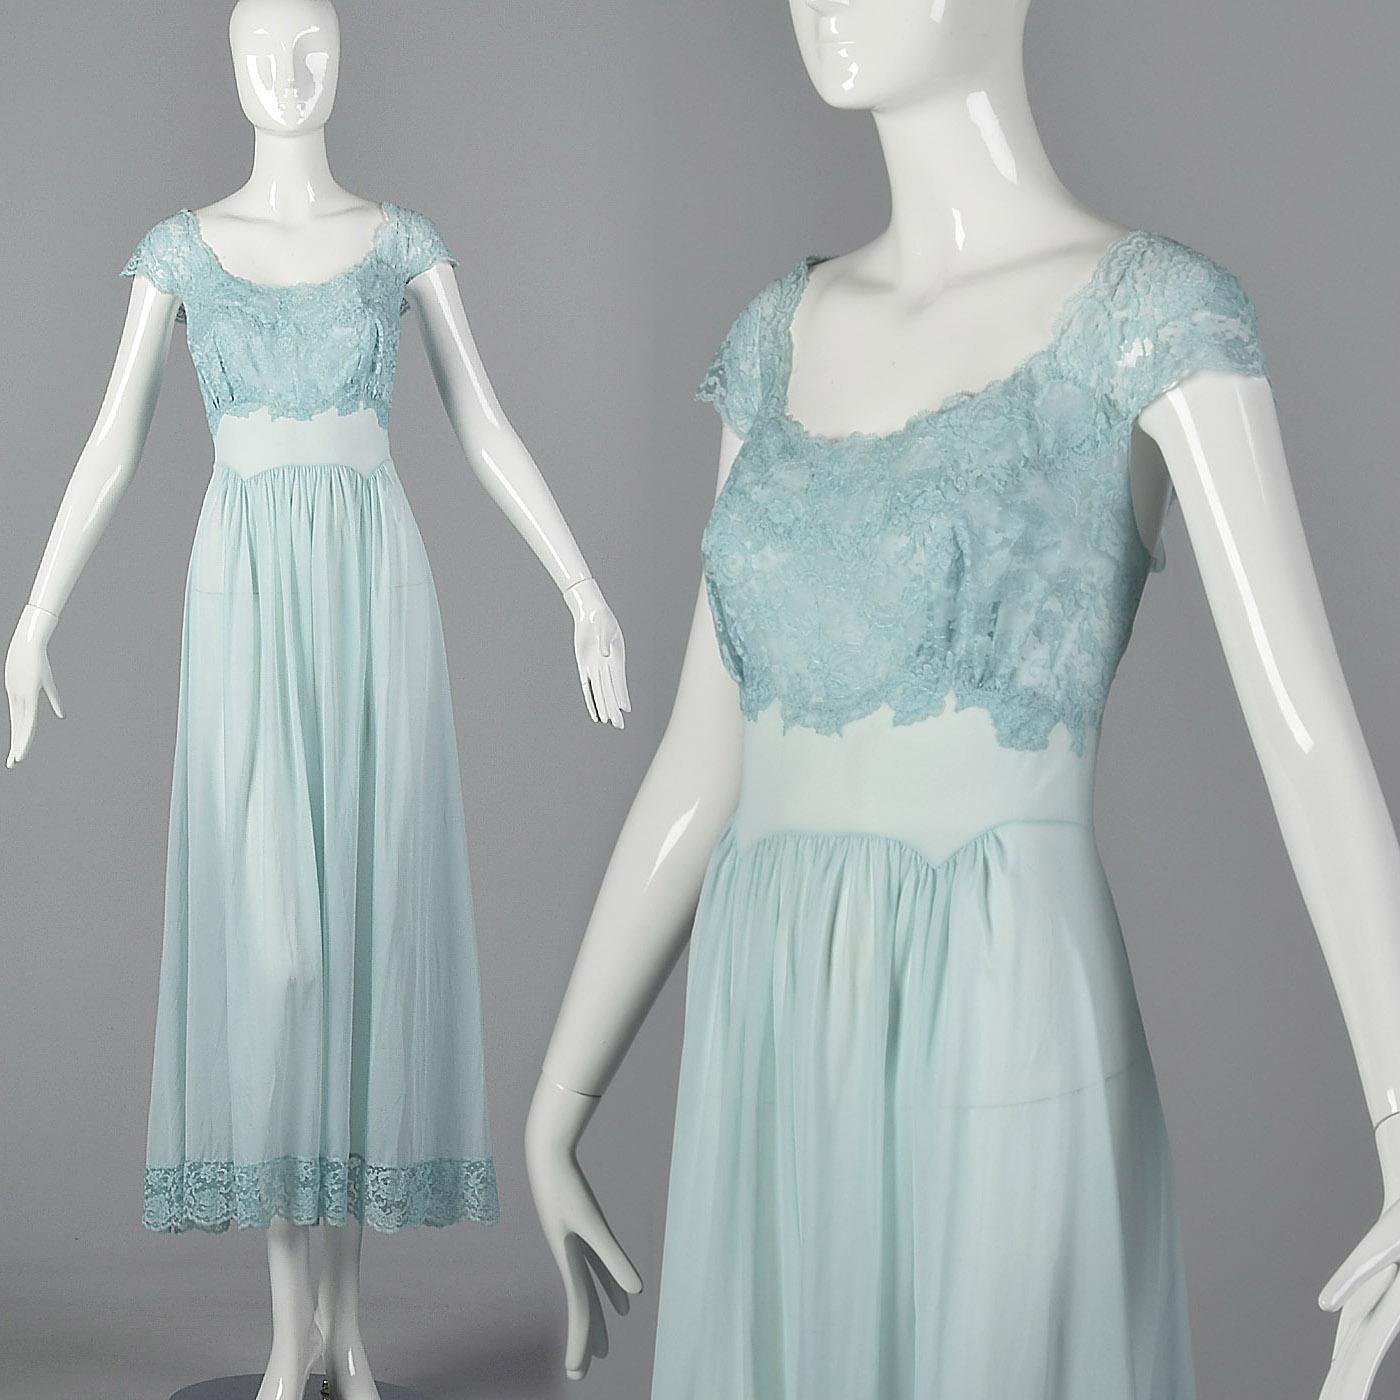 Details about M 1950s Vanity Fair Long Blue Nightgown Lace Shelf Bust  Sleepwear Lounge 50s VTG 252963336